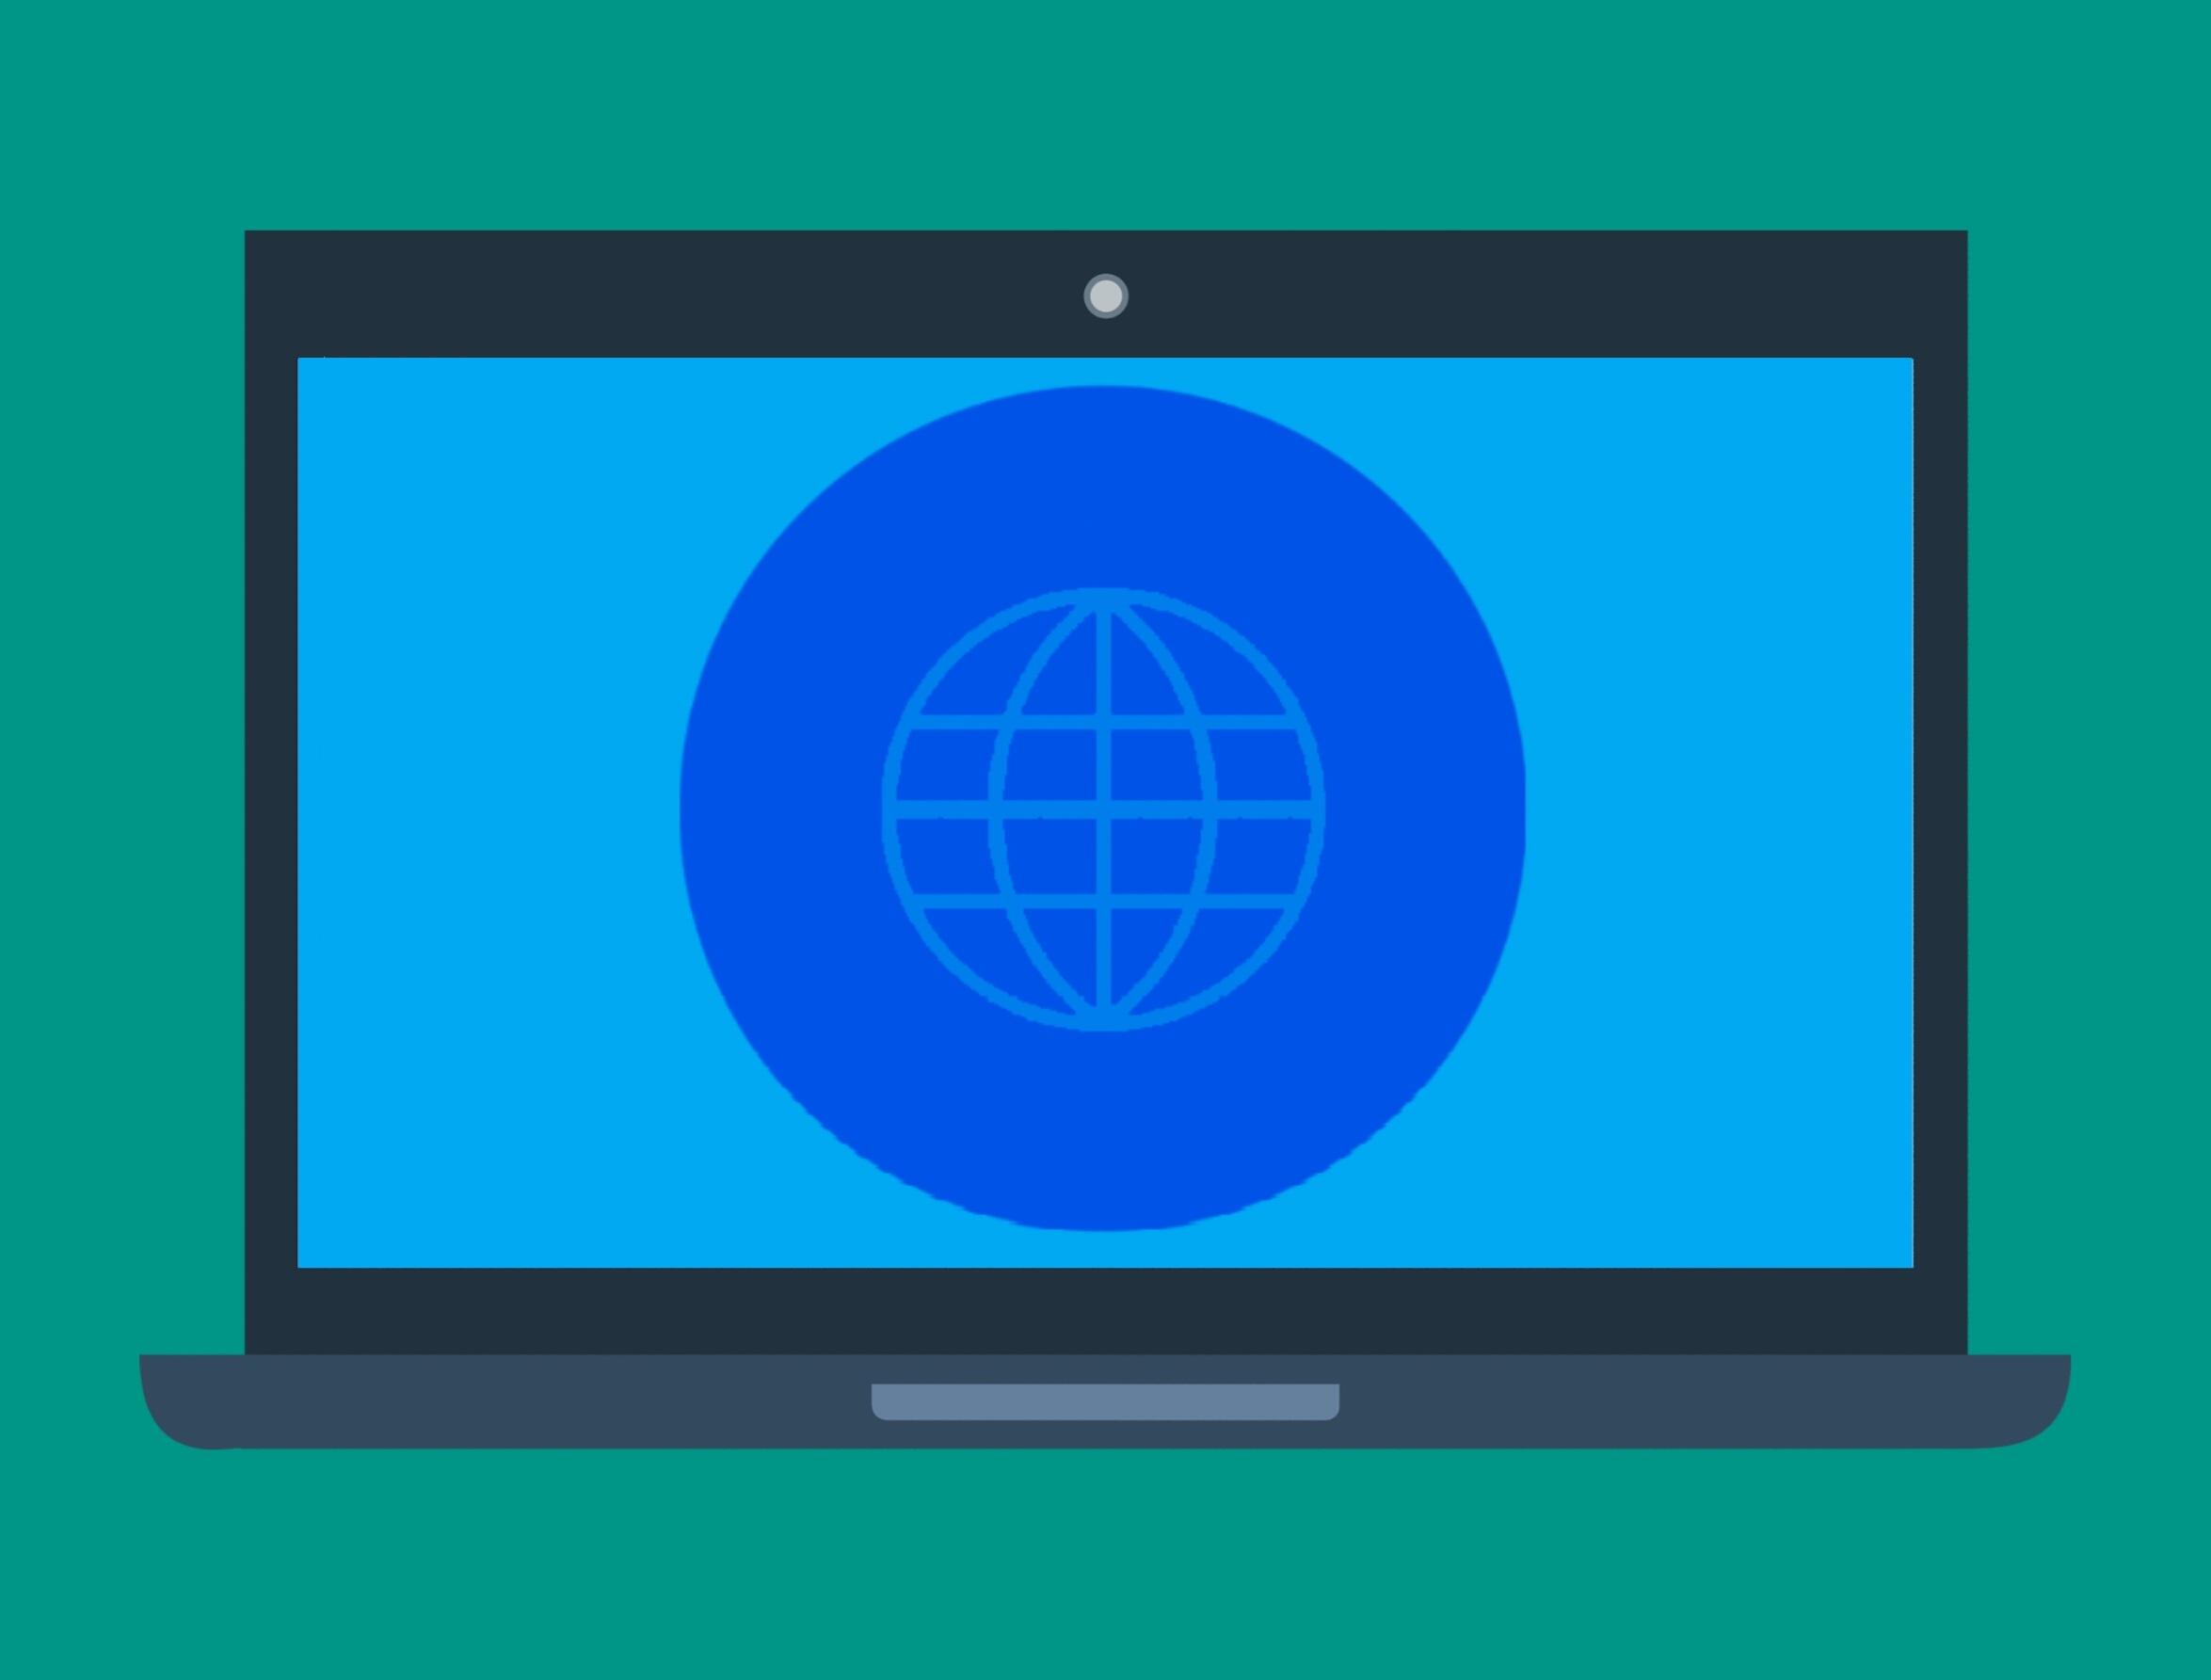 internet-global-earth-communication-www-business-1441535-pxhere.com carreiras